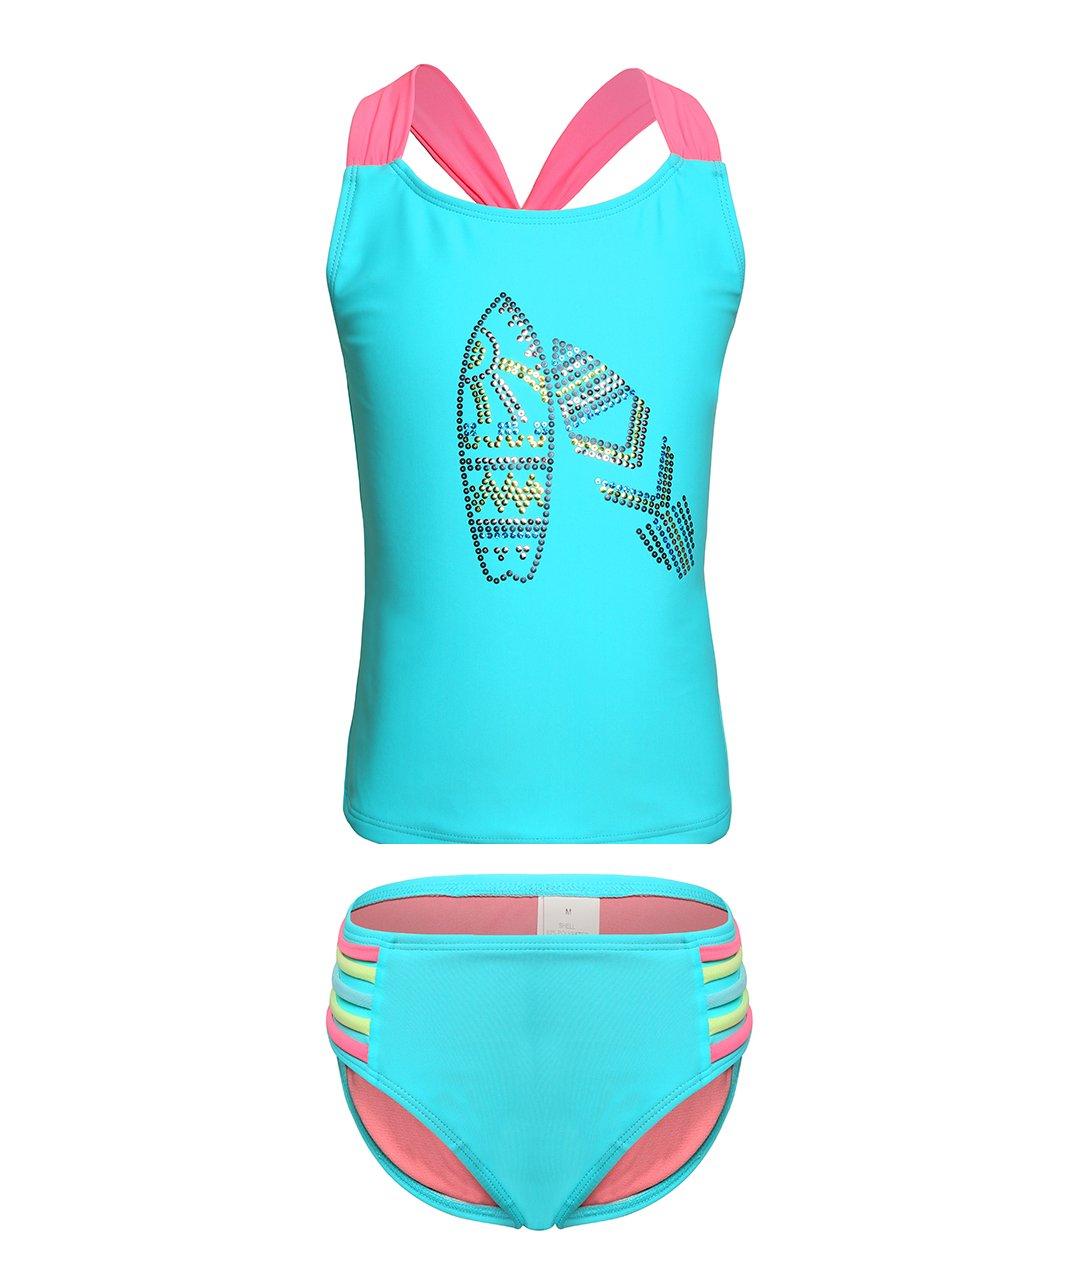 BELLOO Kids Girls Swimsuits, Two Pieces Tankini Swimsuit, Lightblue, Size 14-16